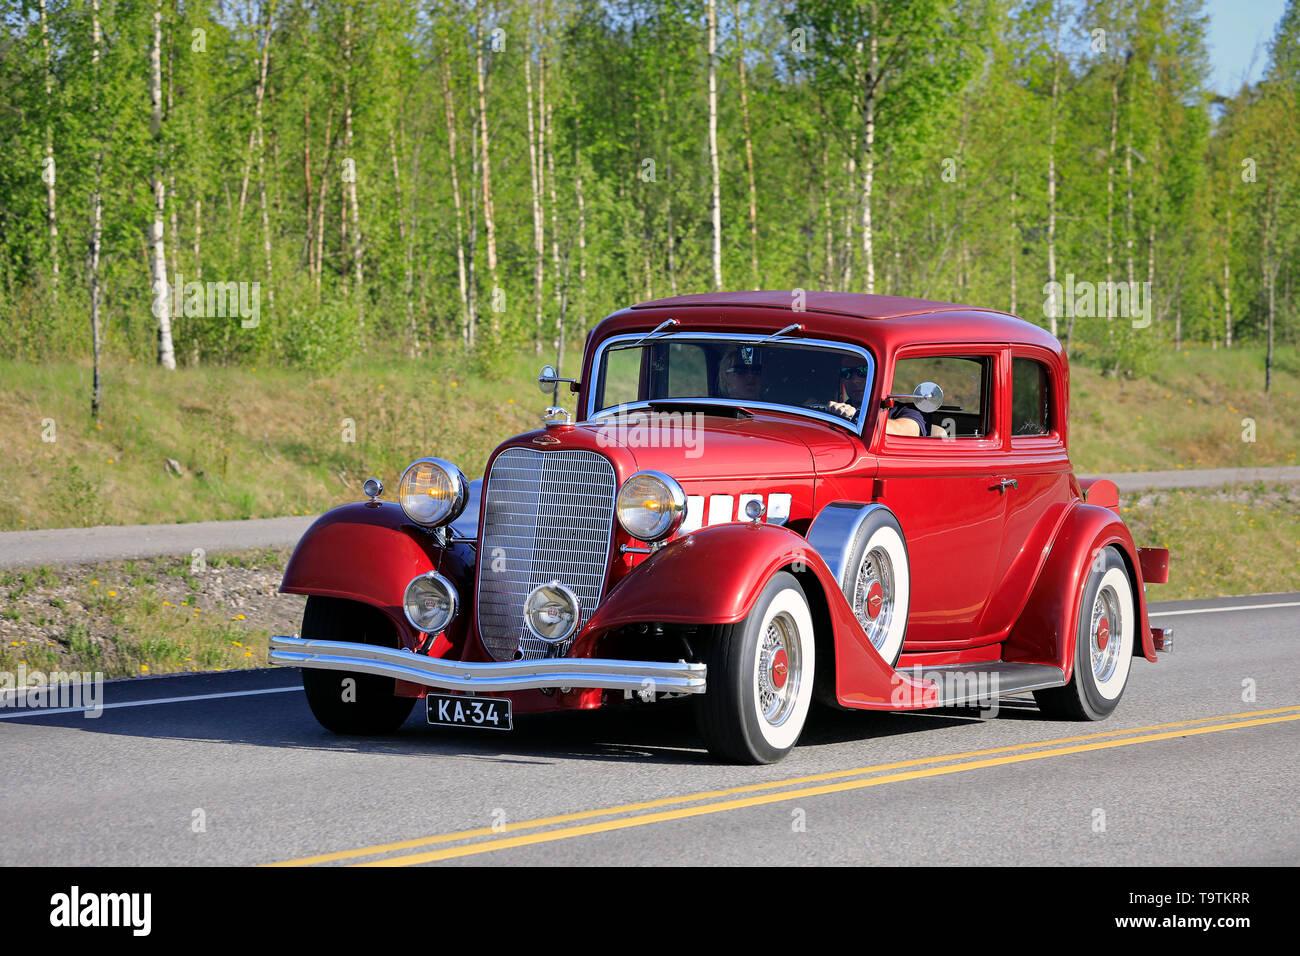 Salo, Finland. May 18, 2019. Beautiful red Lincoln KA classic car, presumably 1934, on Salon Maisema Cruising 2019. - Stock Image